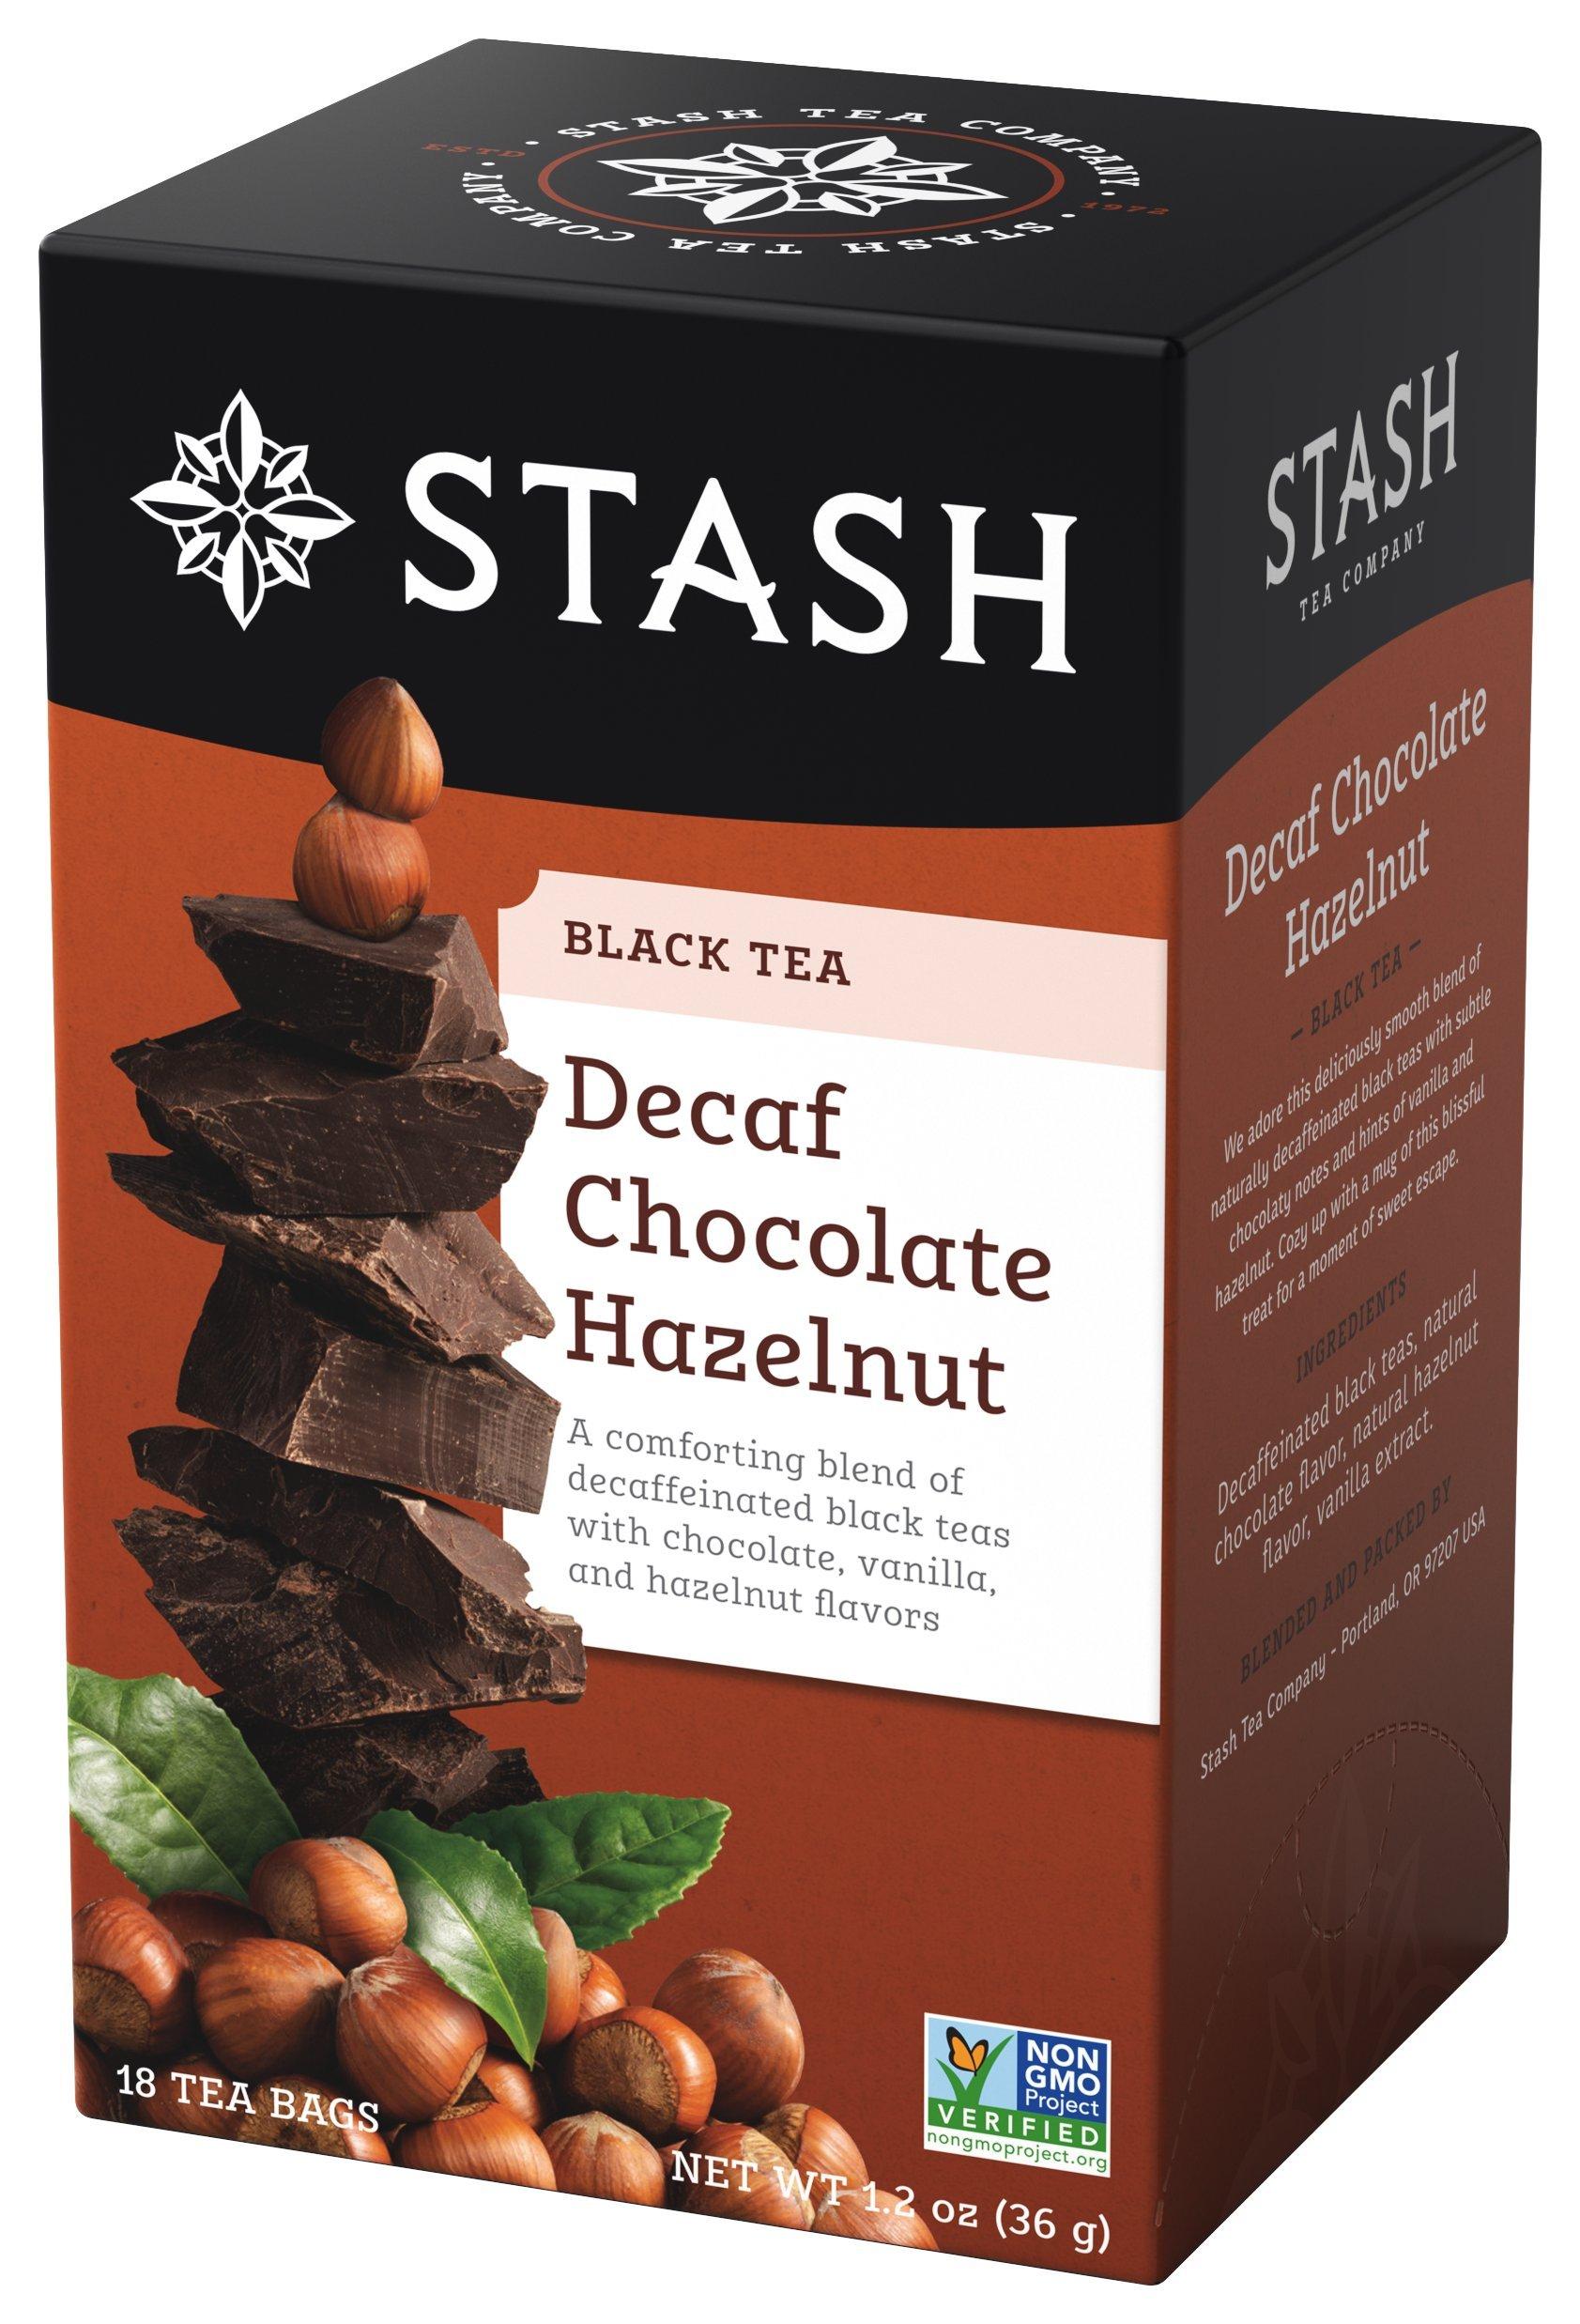 Stash Tea Decaf Chocolate Hazelnut Tea 18 Count Tea Bags in Foil (Pack of 6) Individual Decaffeinated Black Tea Bags for Use in Teapots Mugs or Cups, Brew Hot Tea or Iced Tea